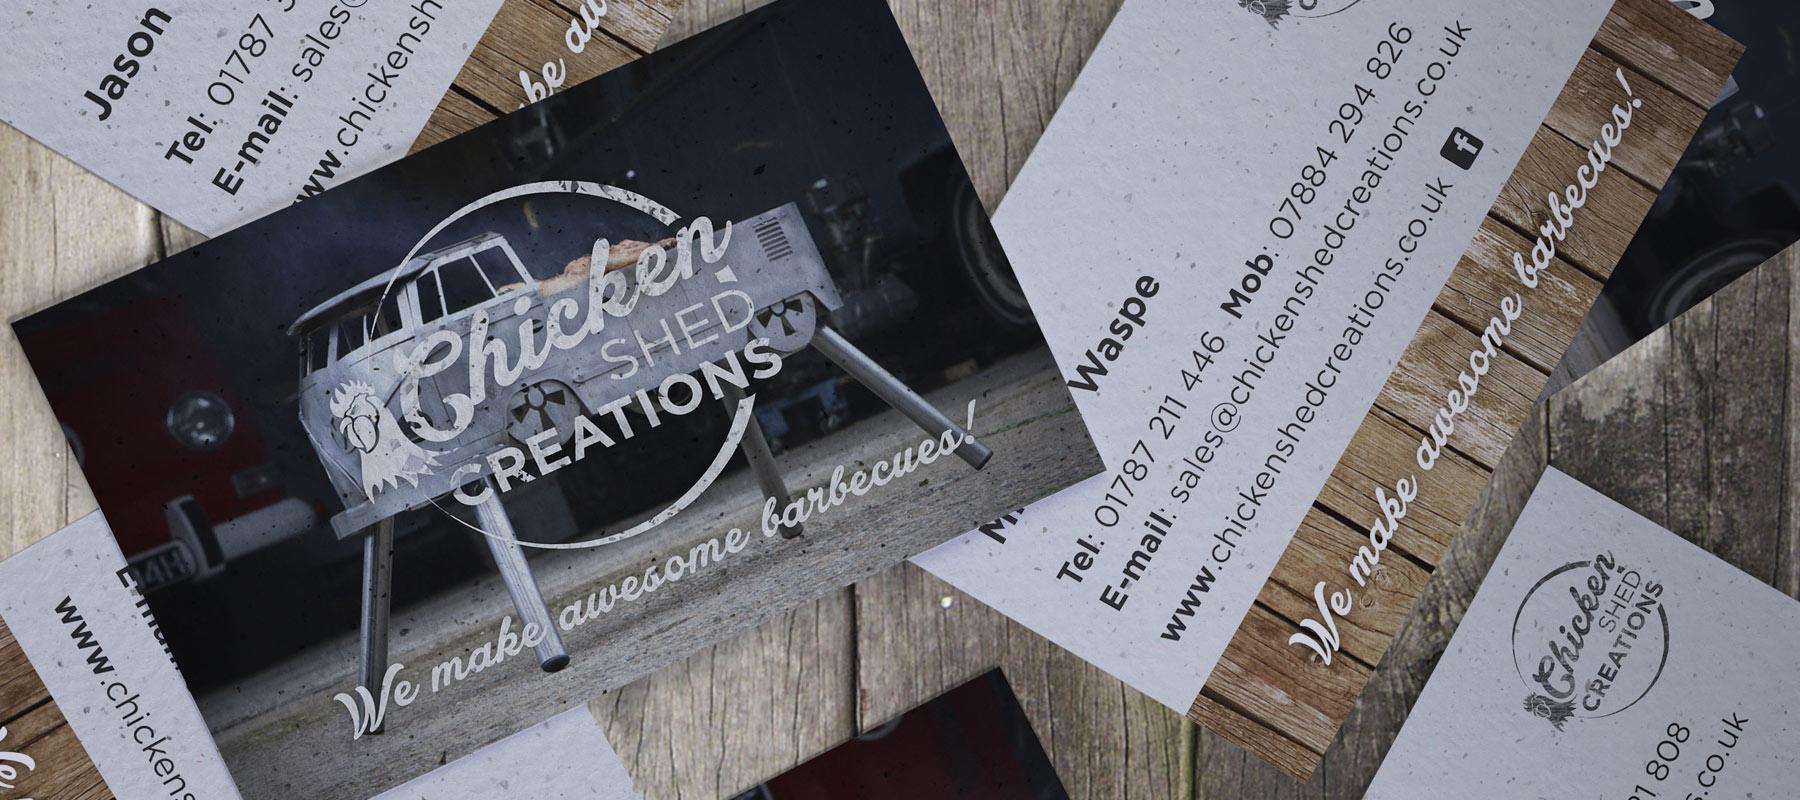 Chicken Shed Creations, Sudbury, Suffolk, Graphic Design, Digital Print